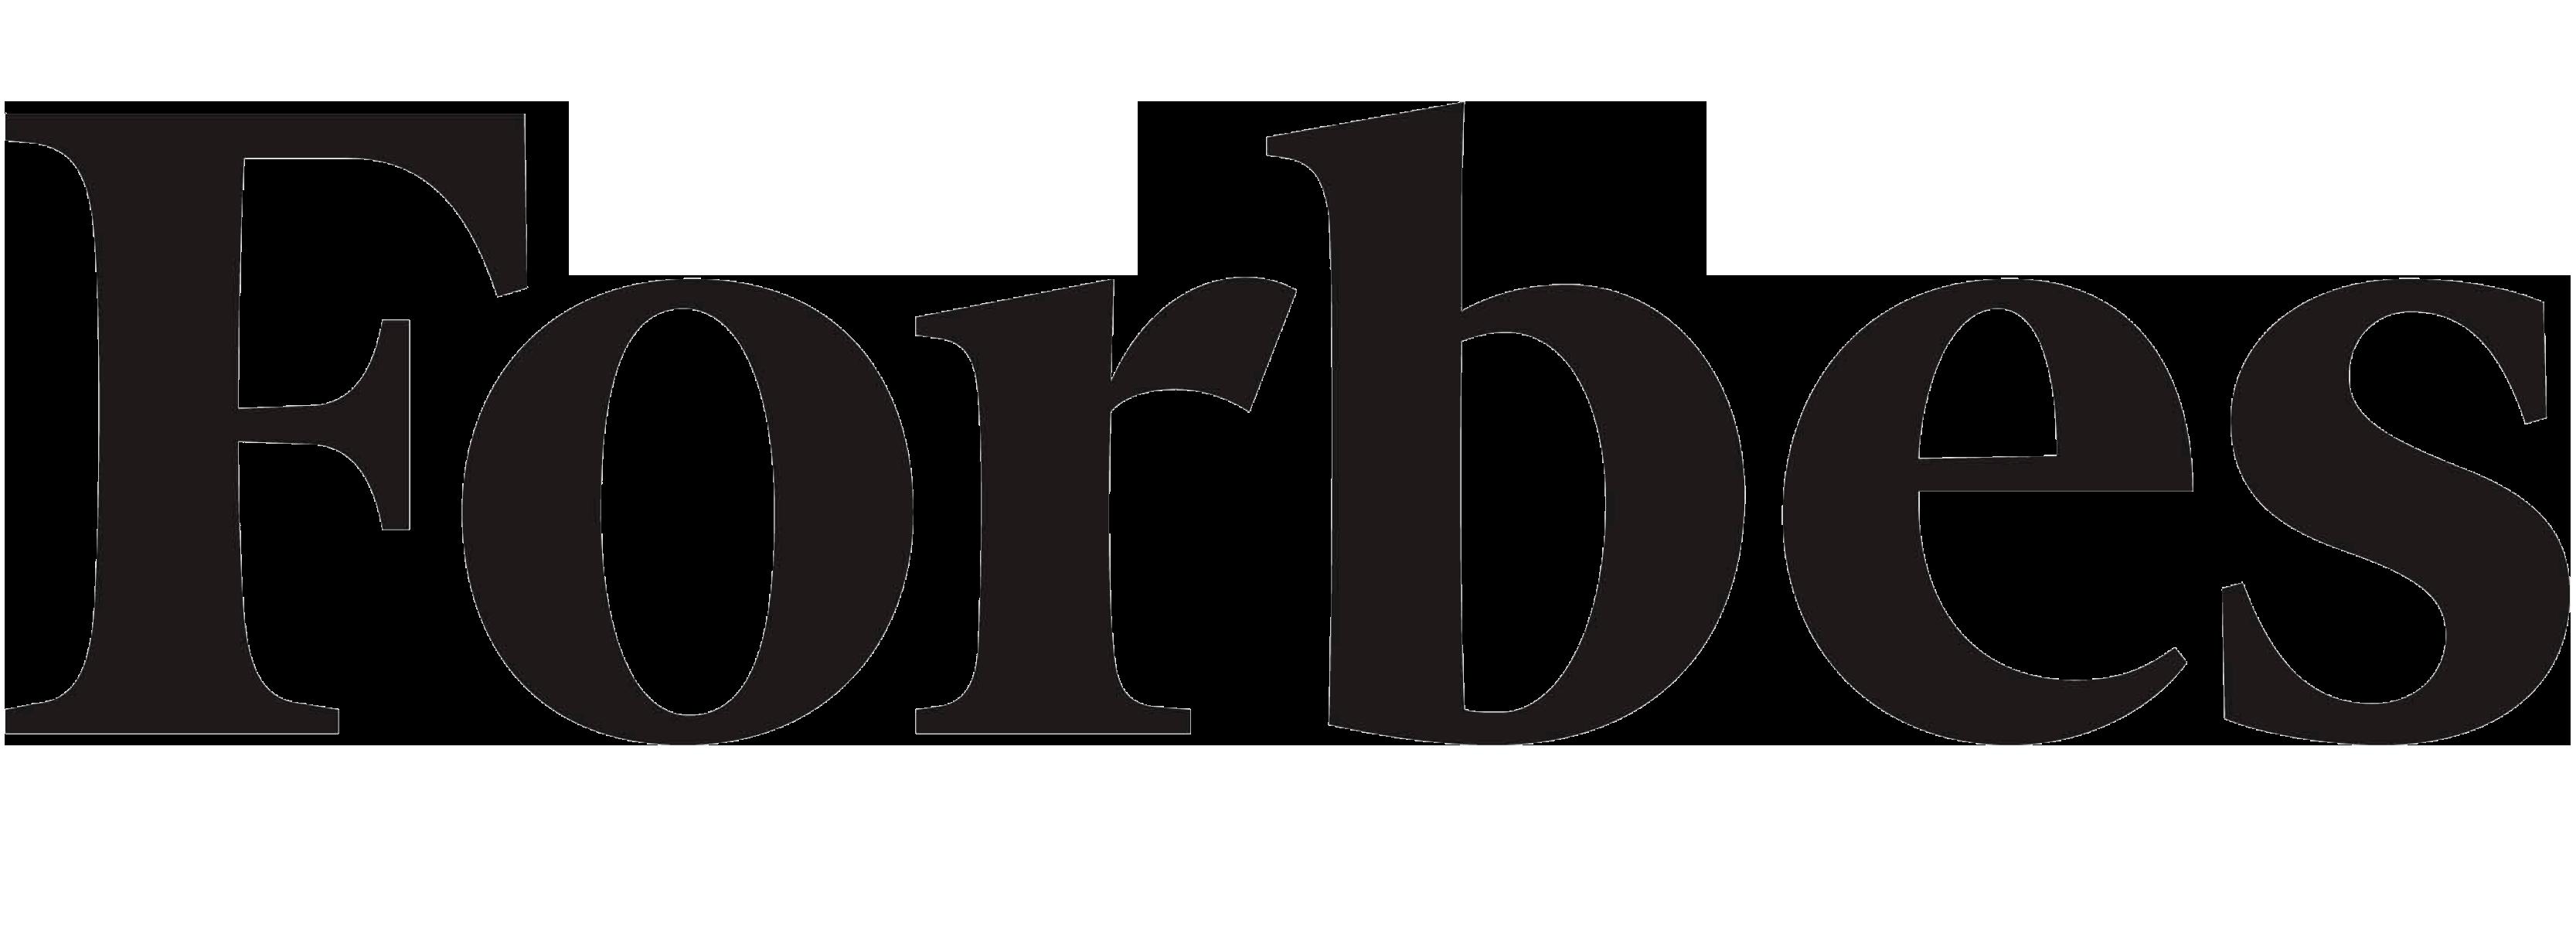 forbes logo grey 60 trustmark